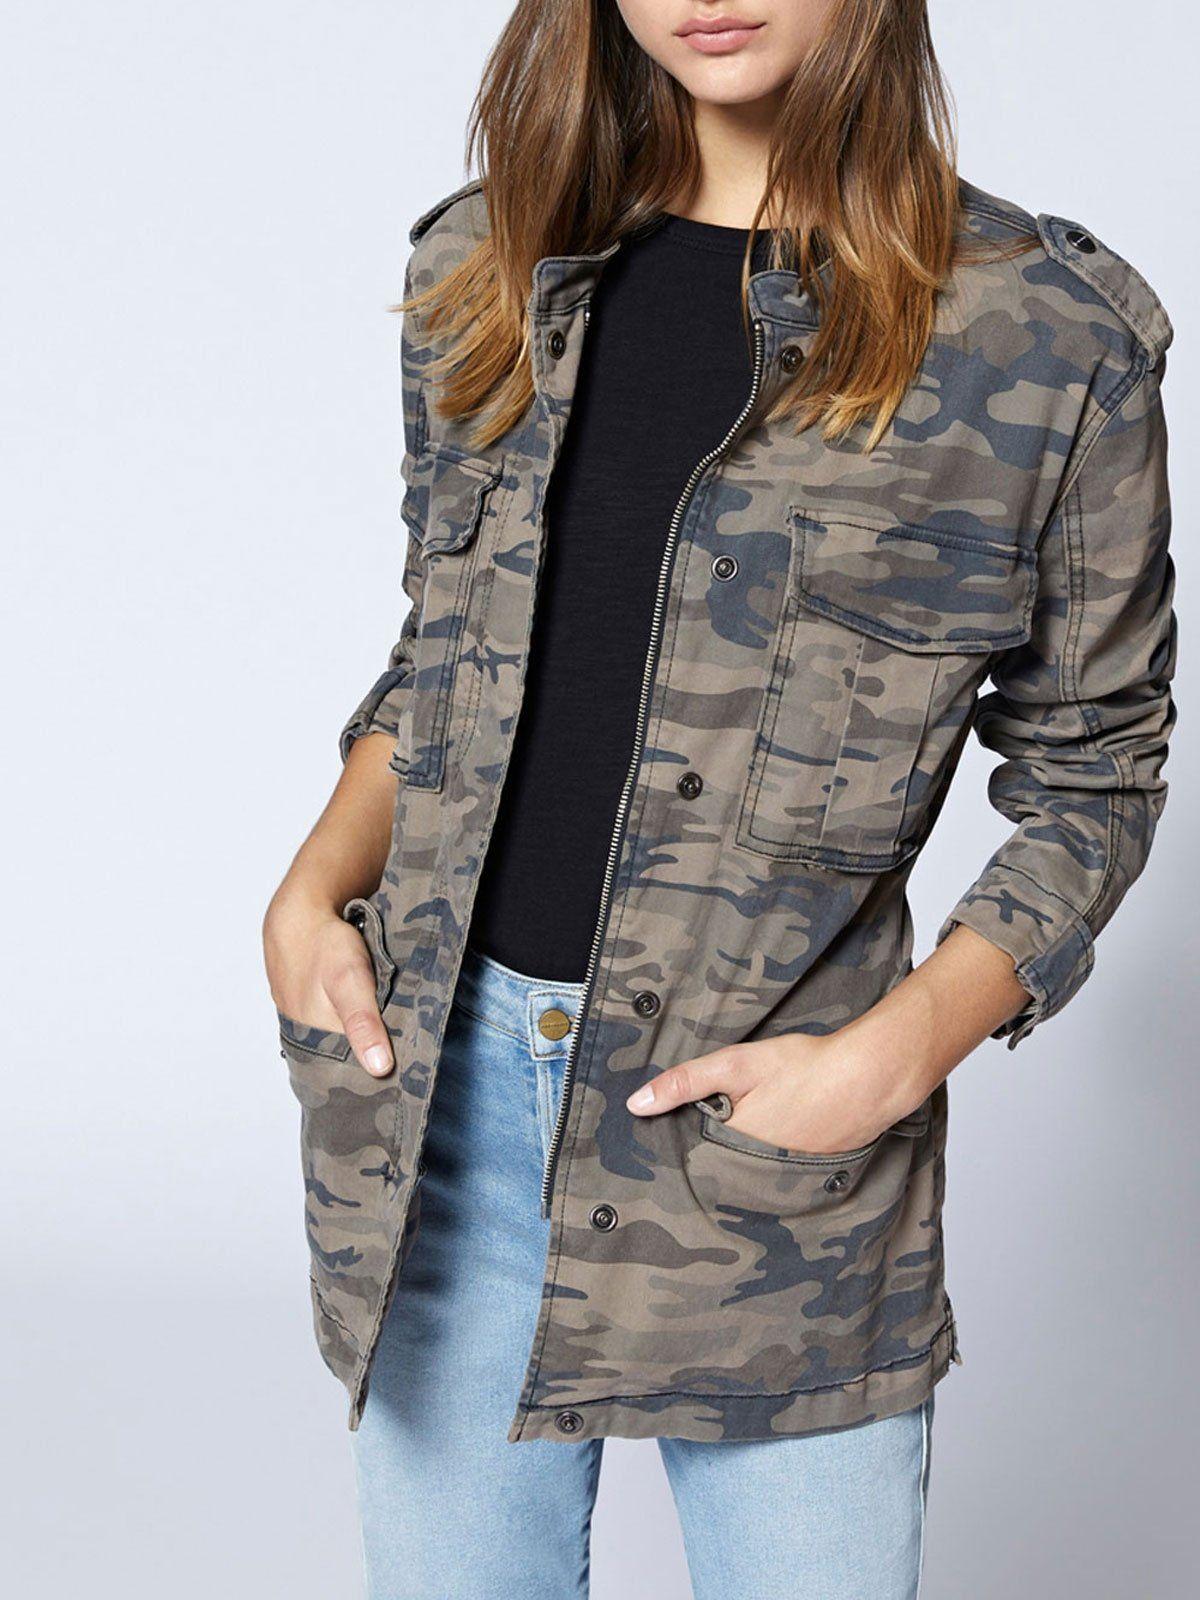 Kinship Surplus Jacket Human Nature Camo By Sanctuary Clothing Jackets Womens Fashion Jackets Clothes [ 1600 x 1200 Pixel ]